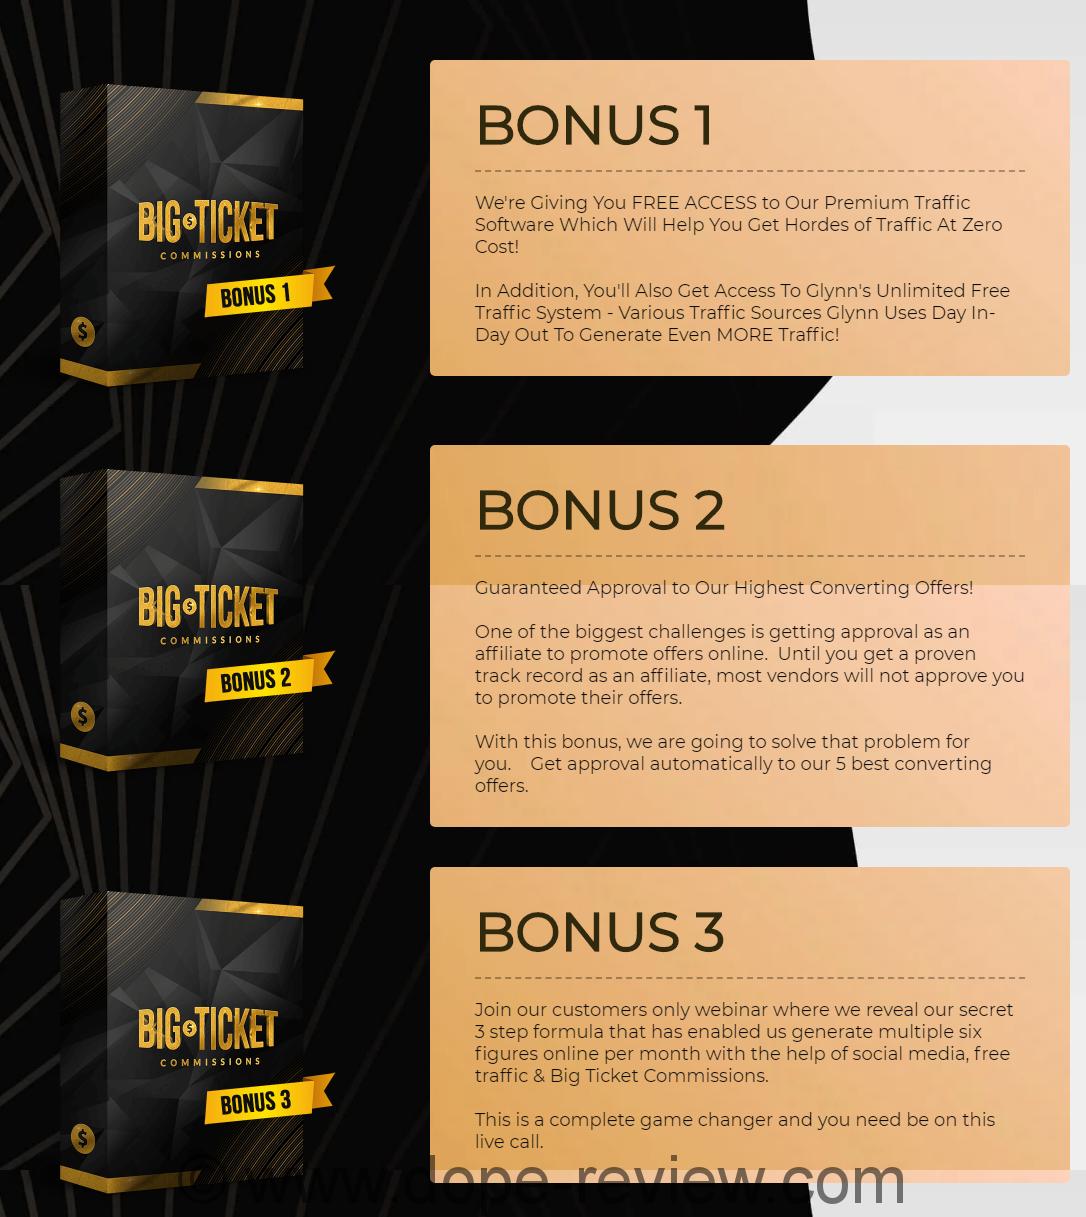 BIG Ticket Commissions Bonus